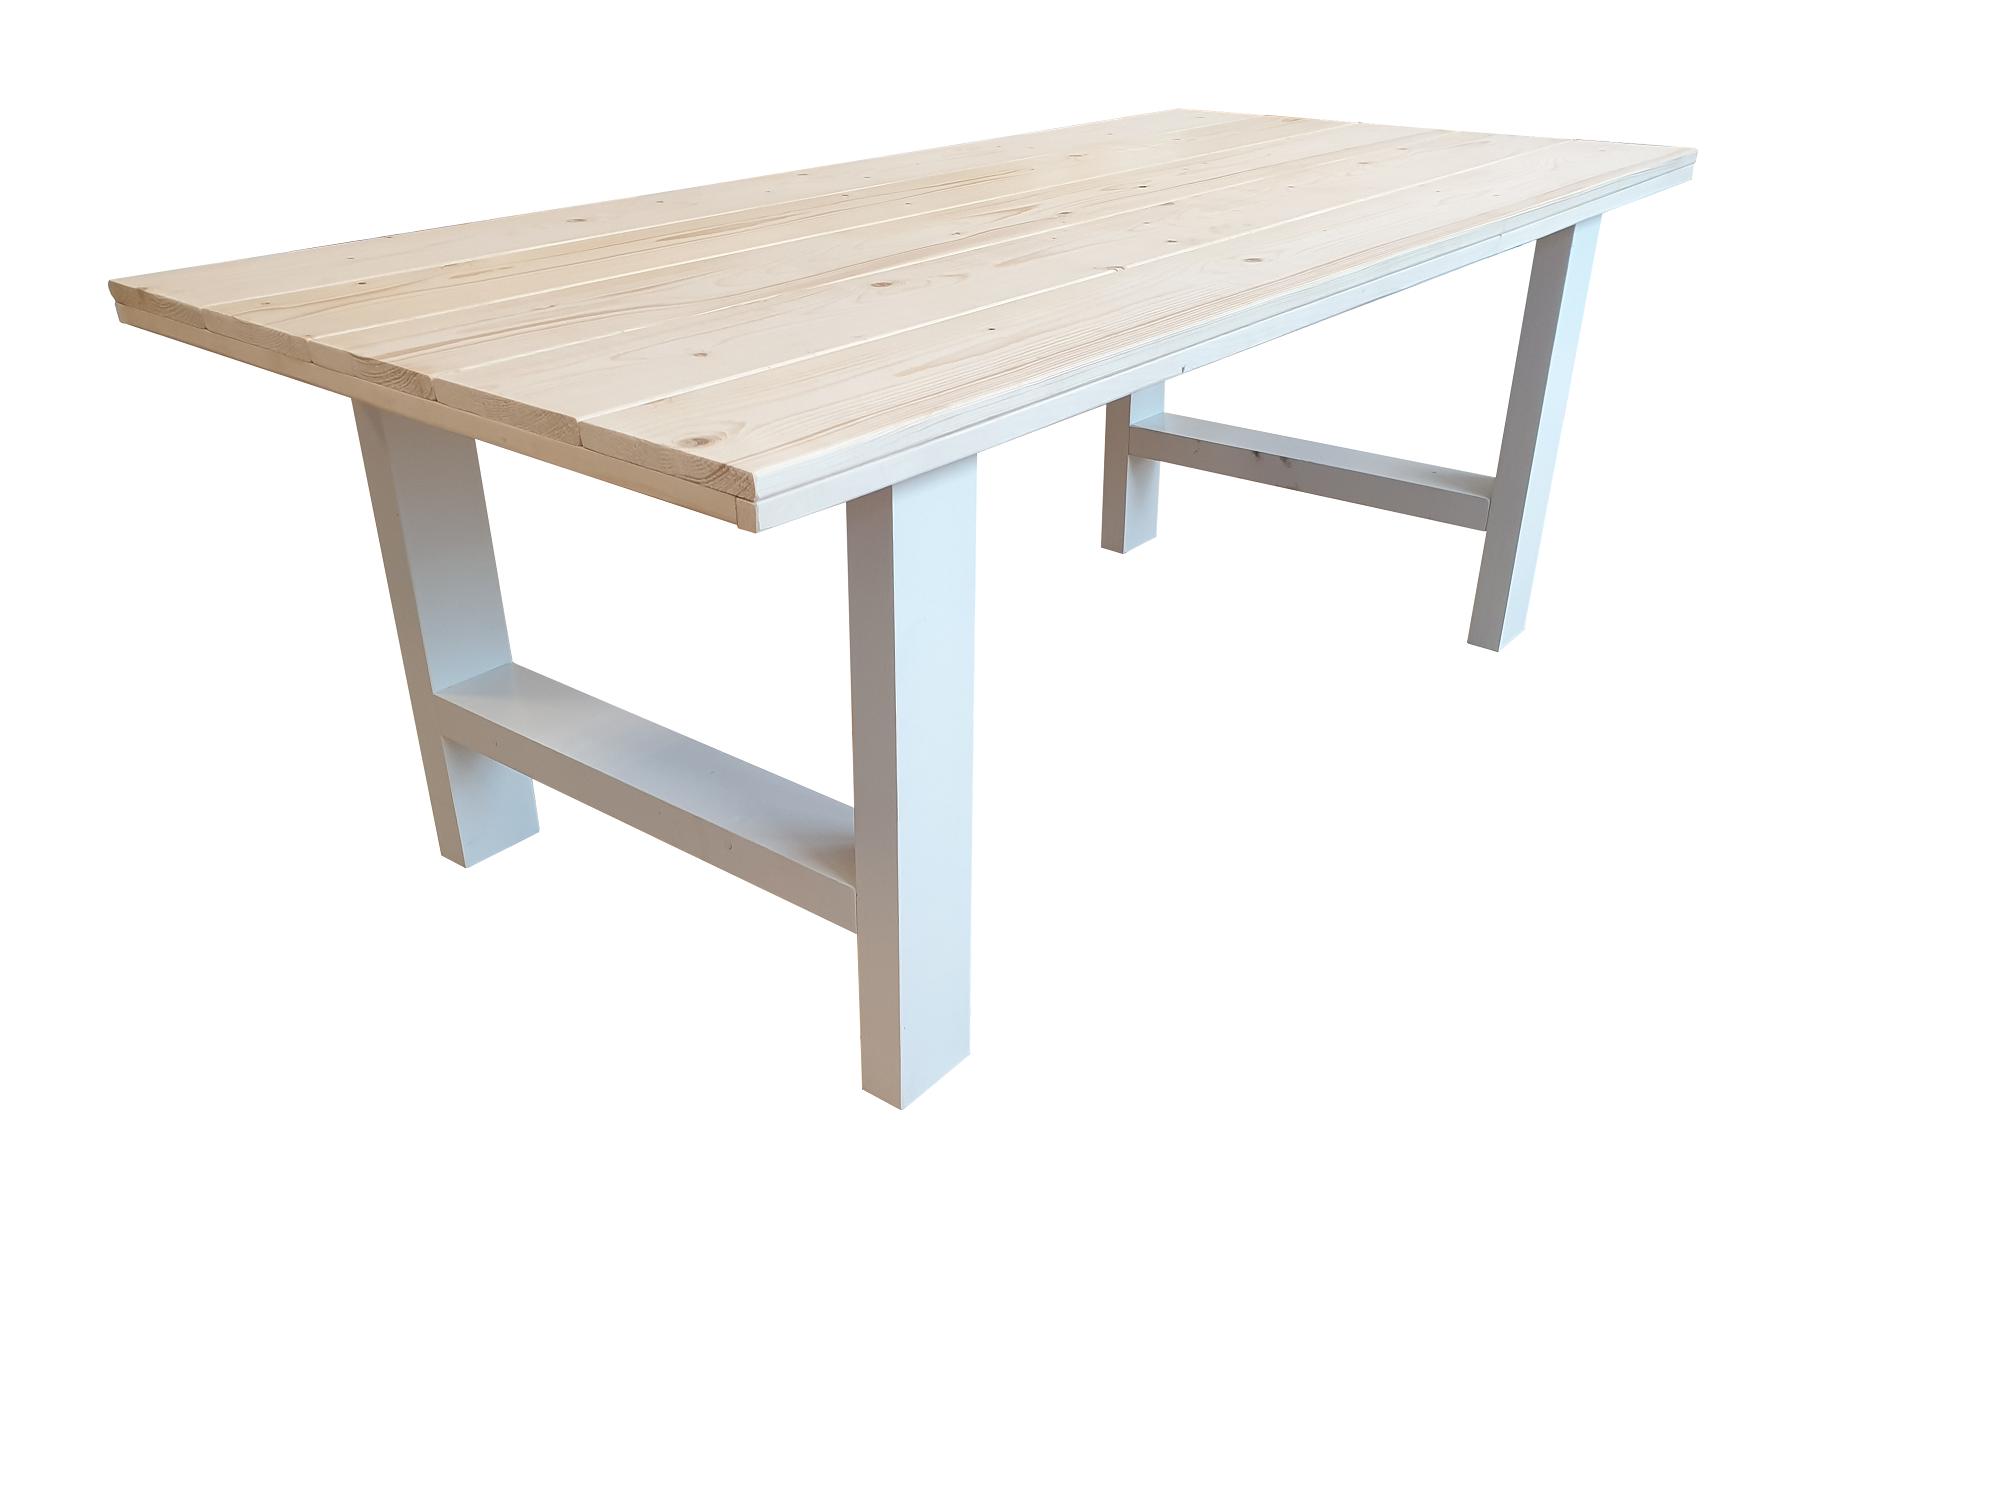 Mooie tafel met stoer en stevig blad for Stijgerhout tafel